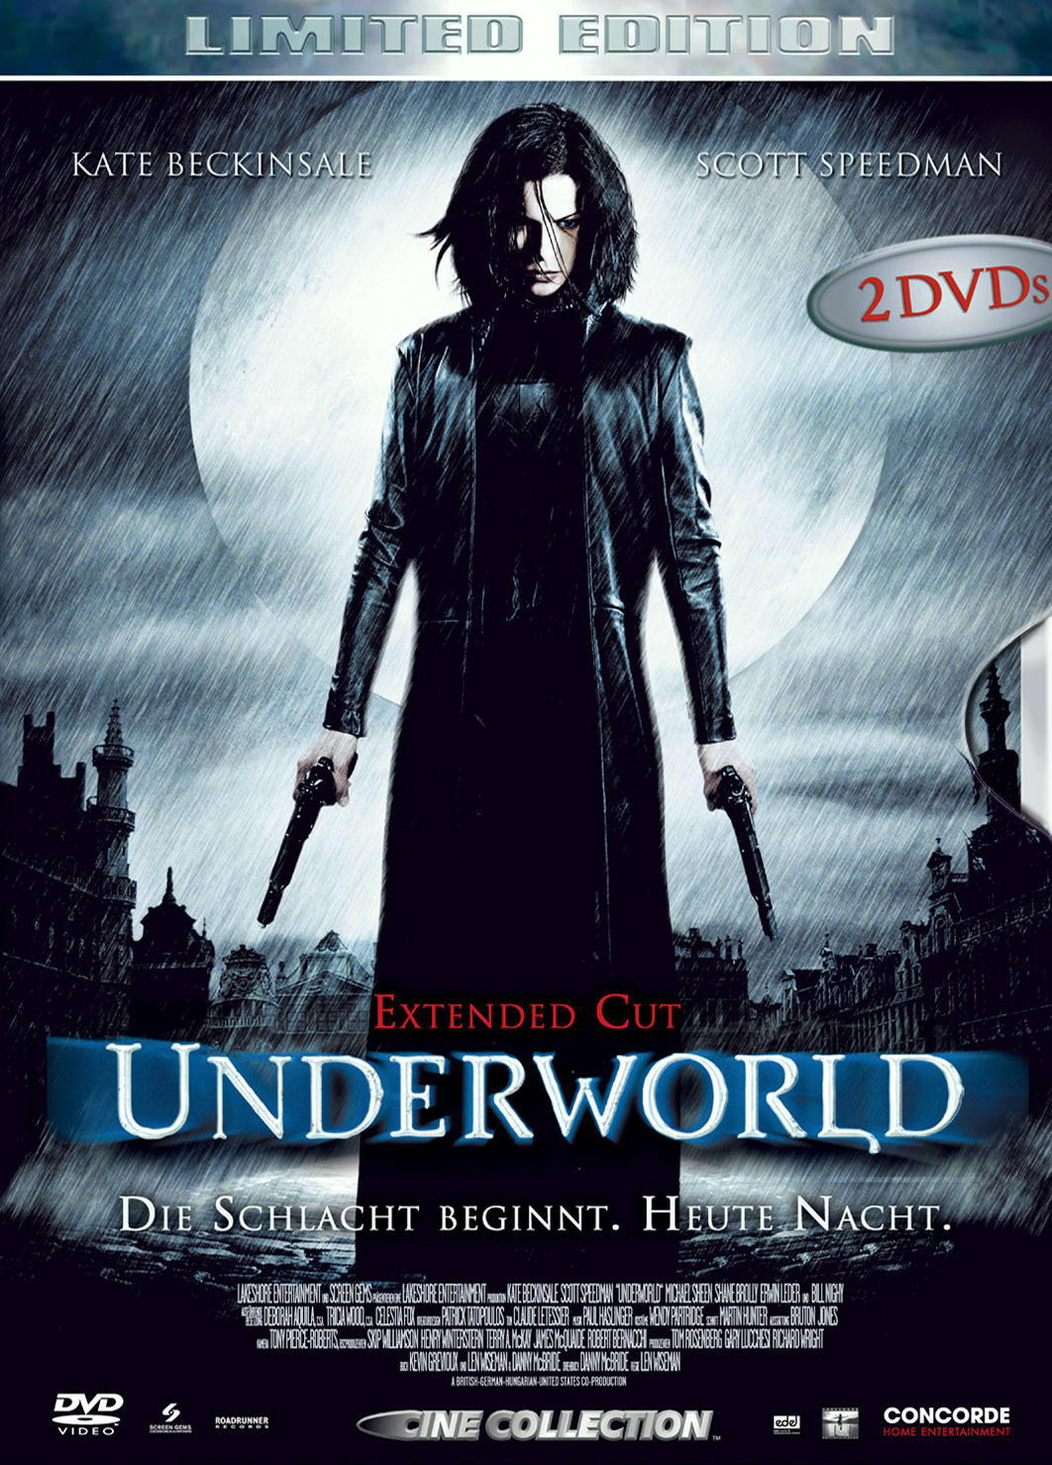 Underworld Ext.Cut - Steelcase Ltd.